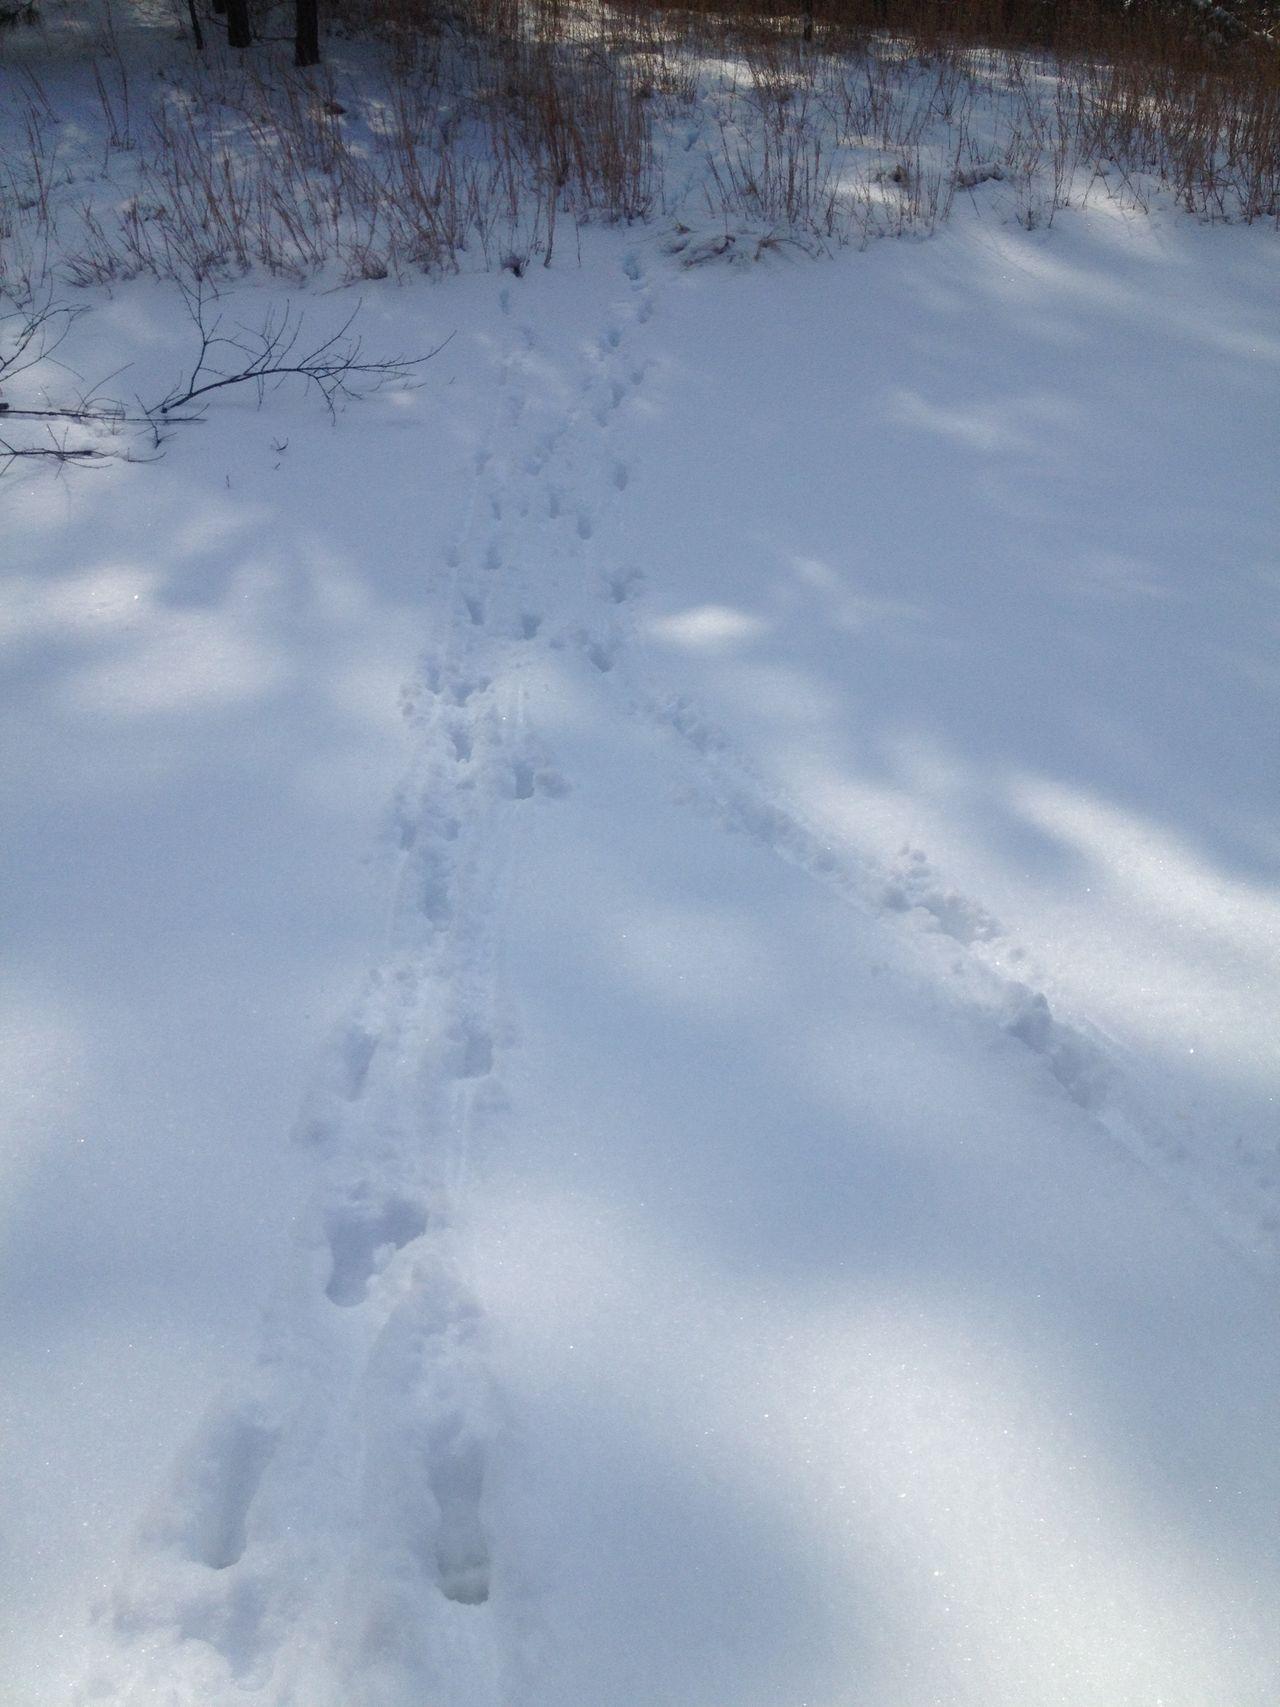 Deer tracks at Cape Henlopen State Park in Lewes, Delaware Deer Tracks Tracks In Snow Tracks Deer Snow Light And Shadow Sunlight Dappled Sunlight